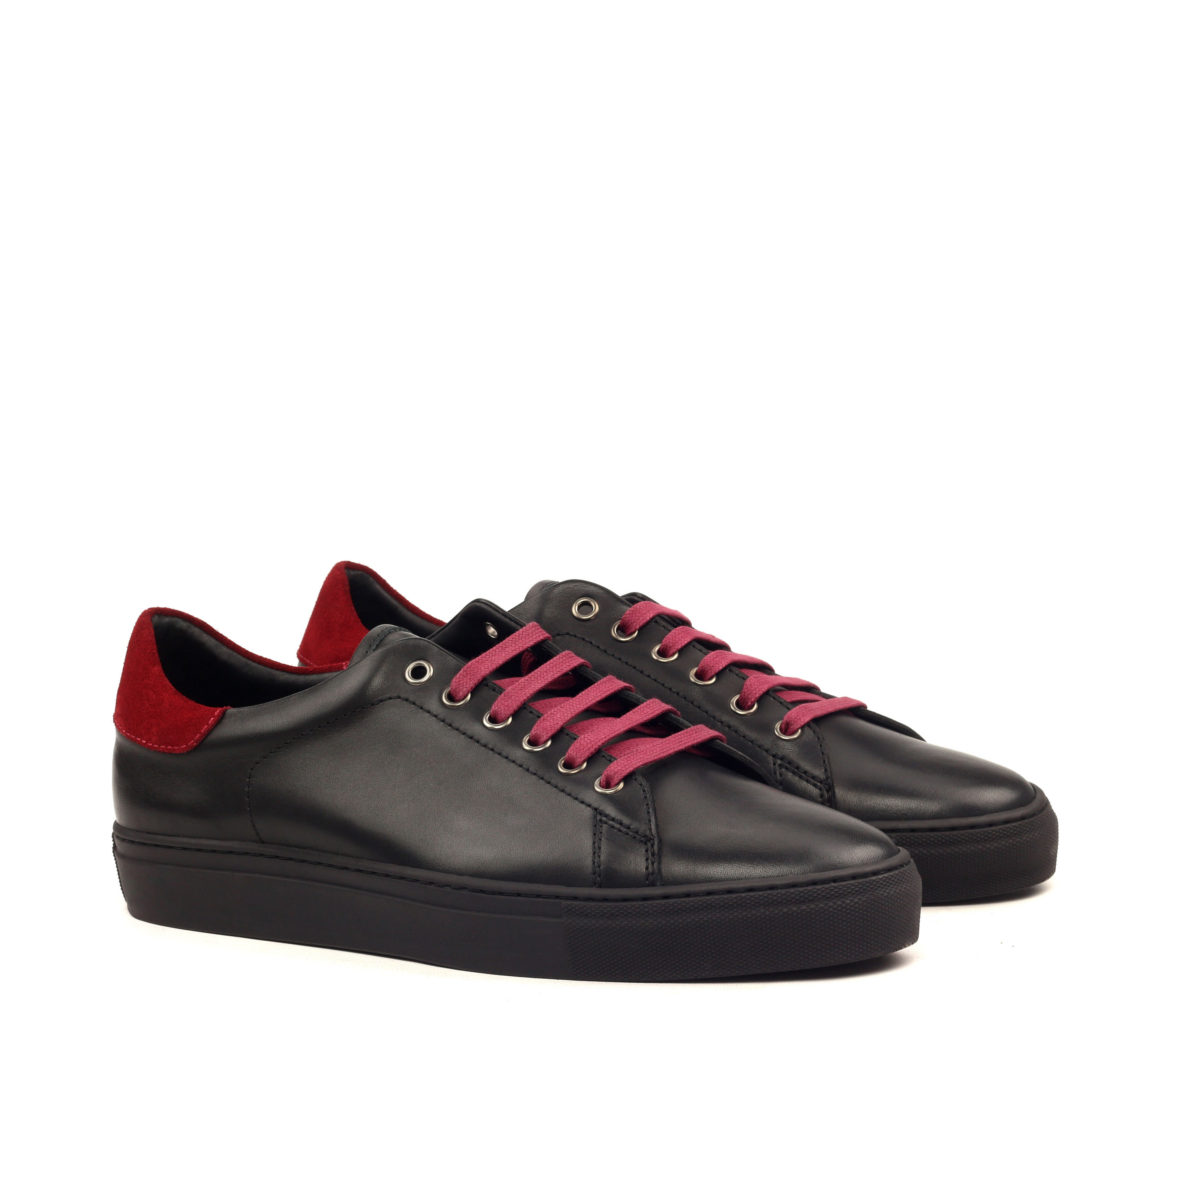 LEO black box calf sneakers